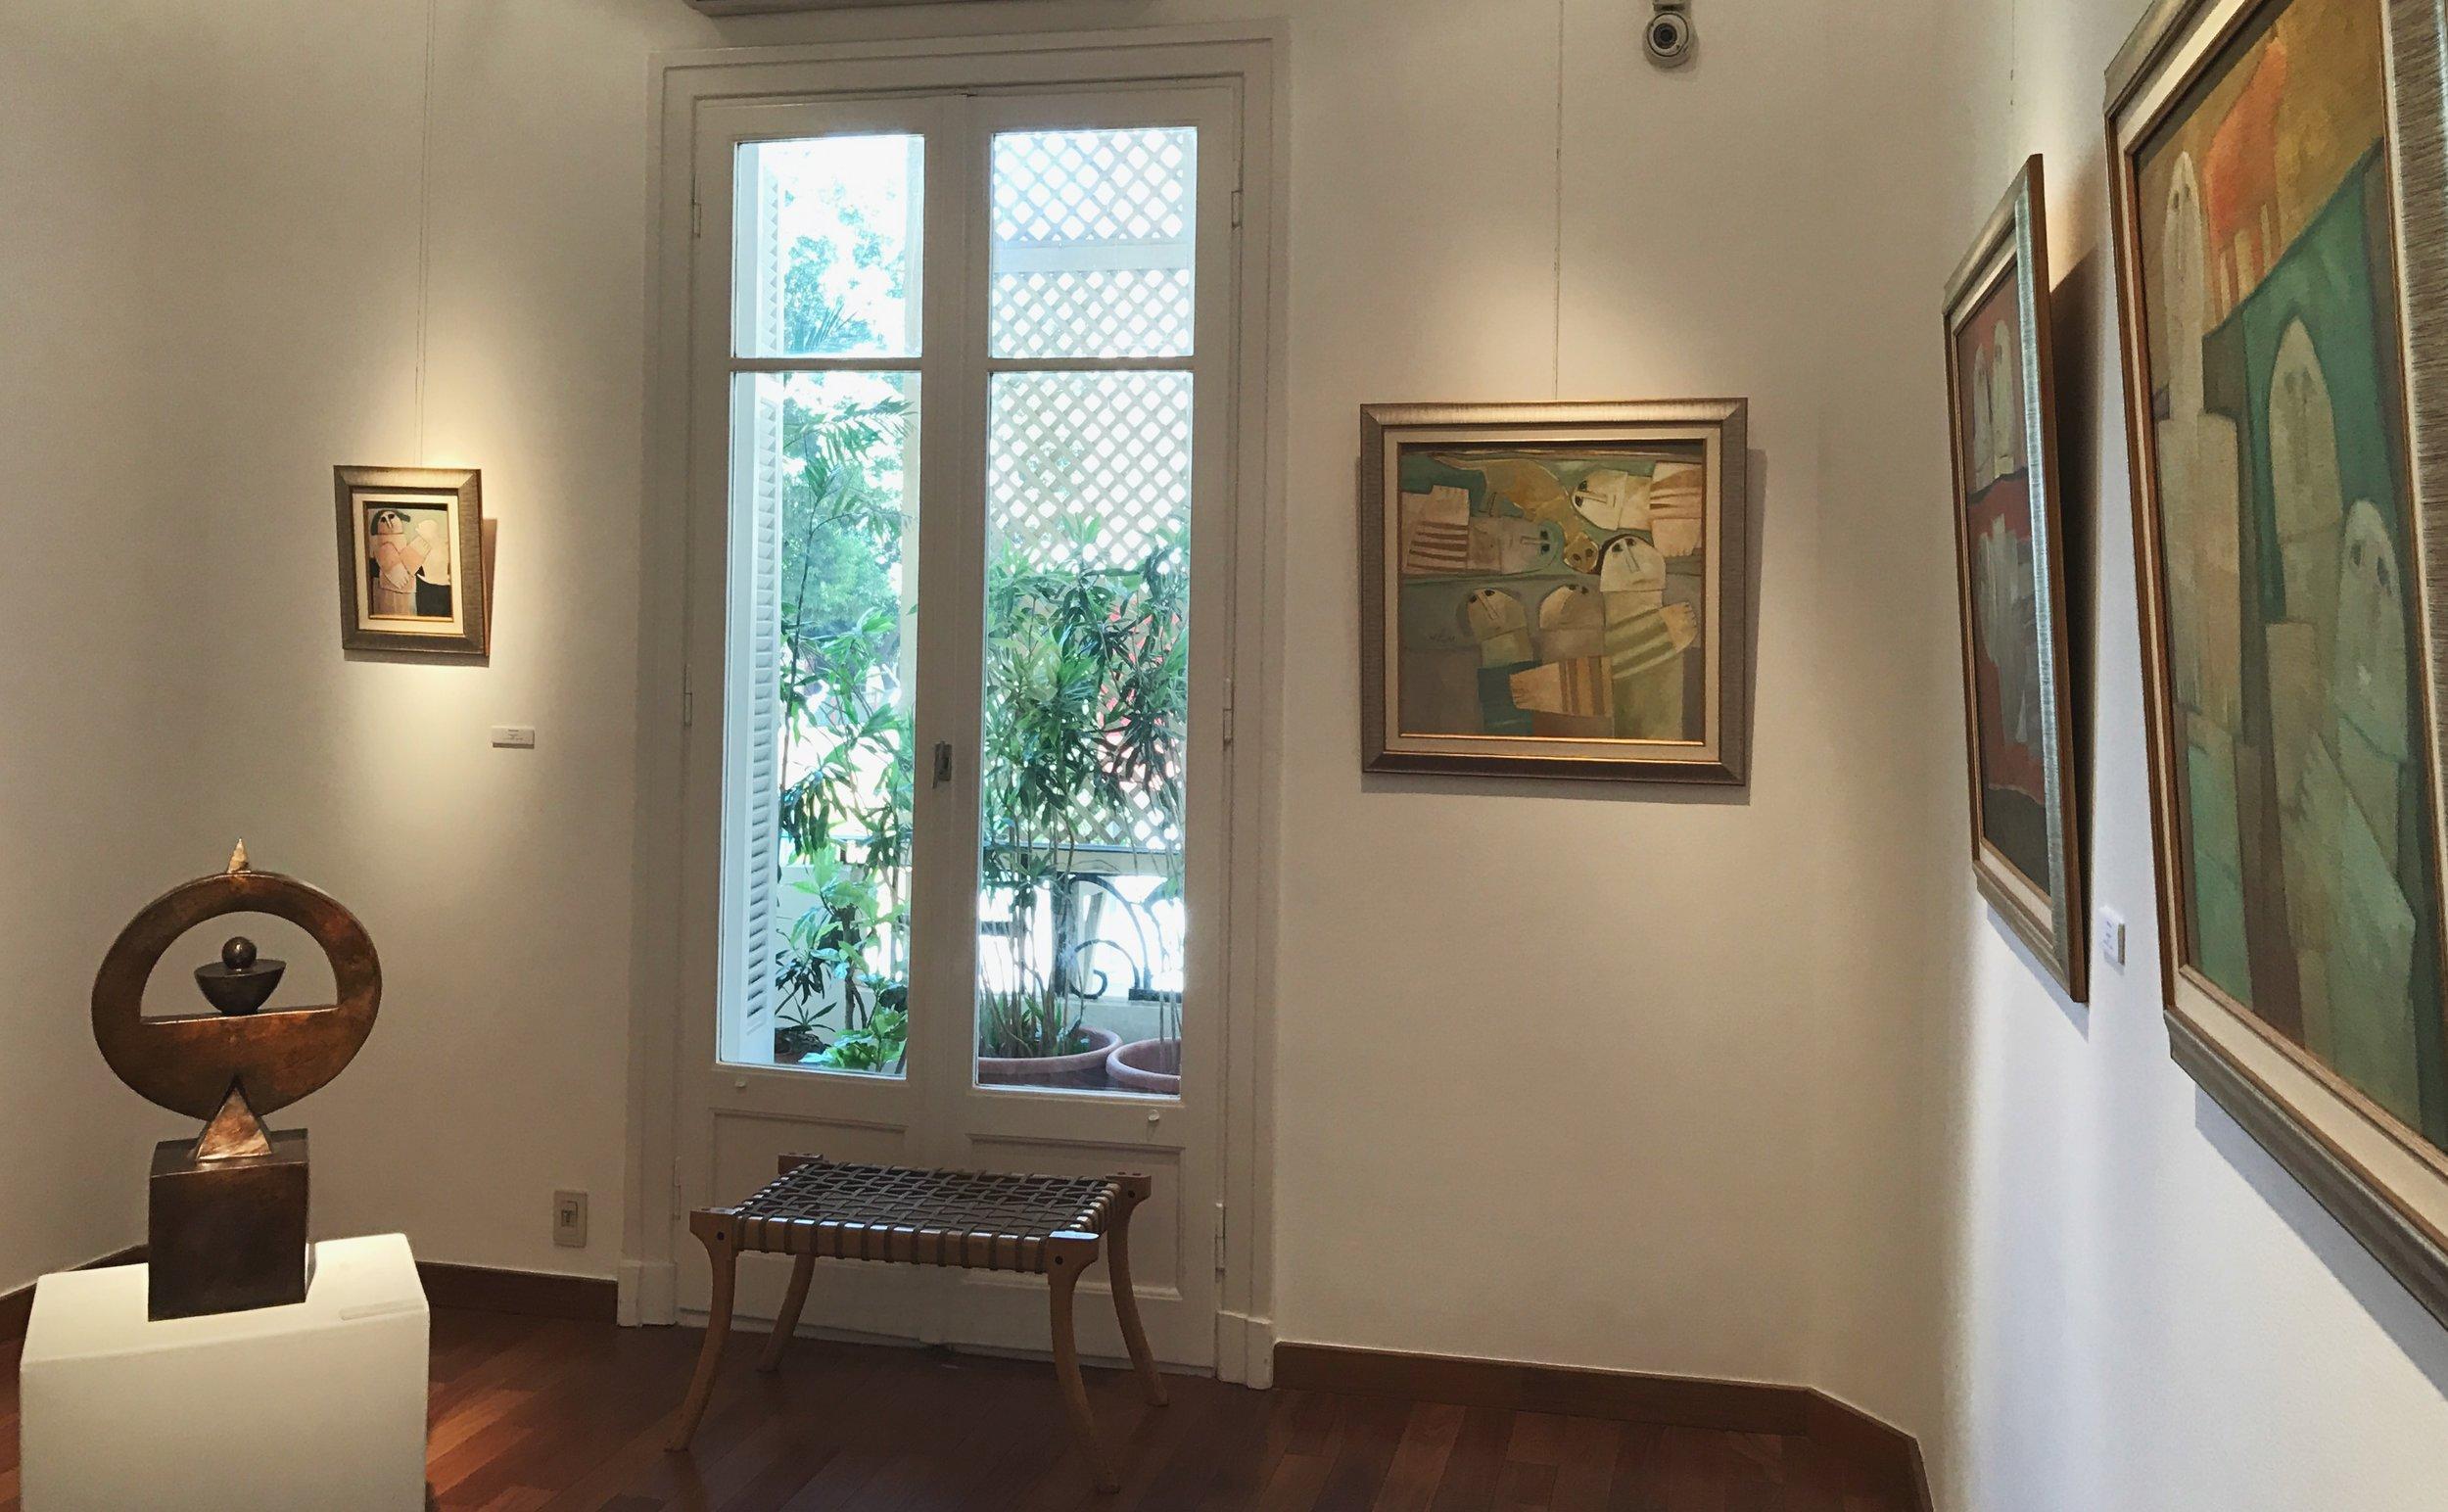 Zamalek Art Gallery'Masterpieces XVI'16.7.17 - 20.9.1711 Brazil St. -